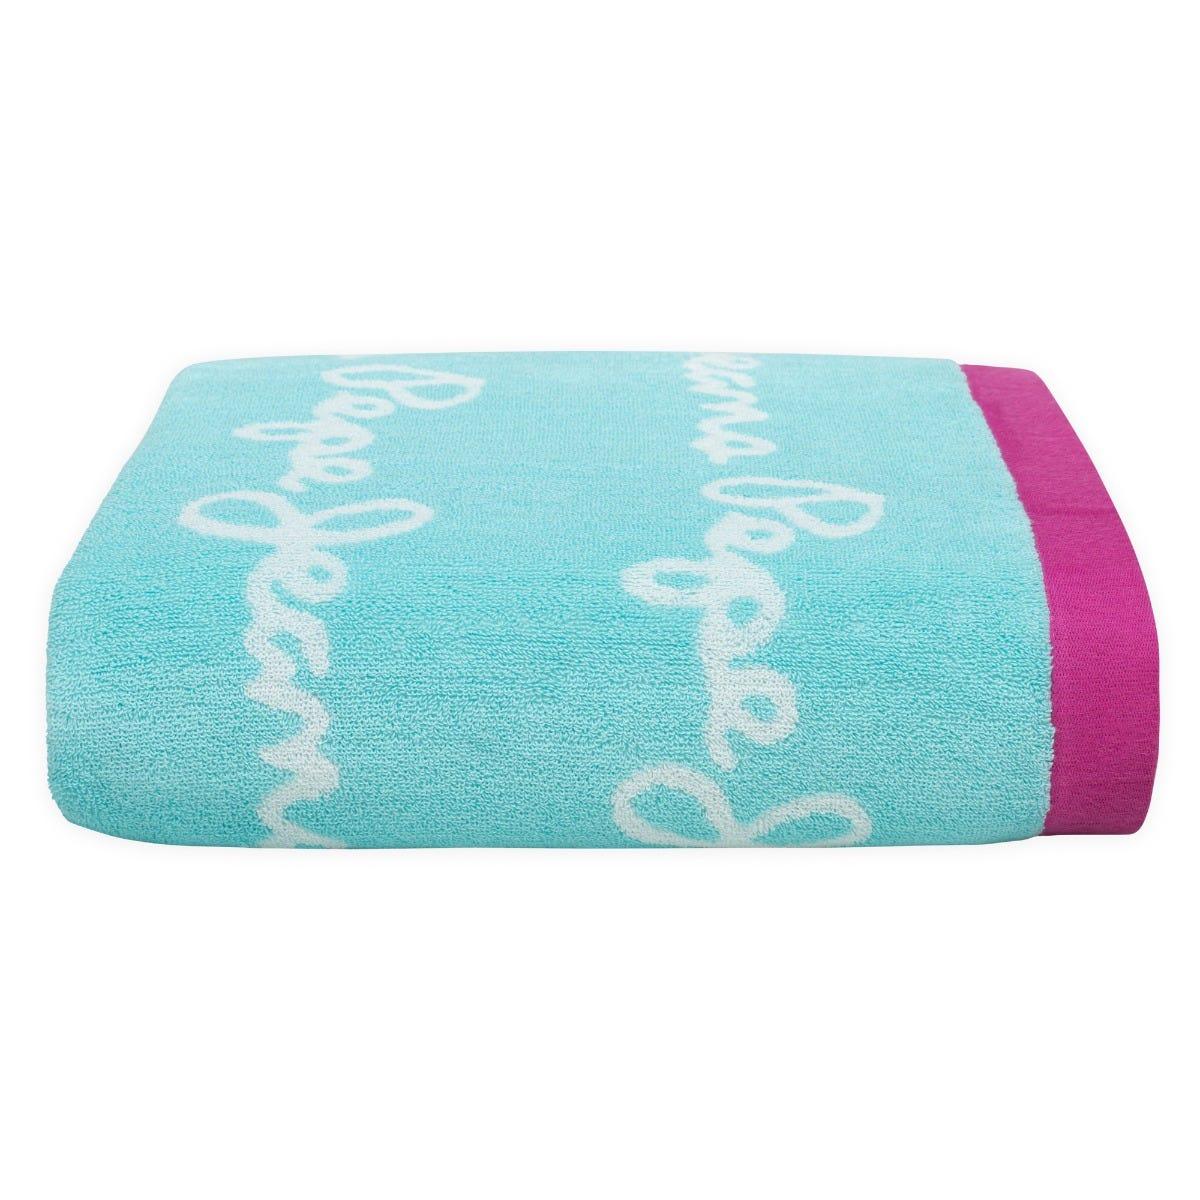 Toalla medio baño Pepe Jeans® Mirelle en turquesa